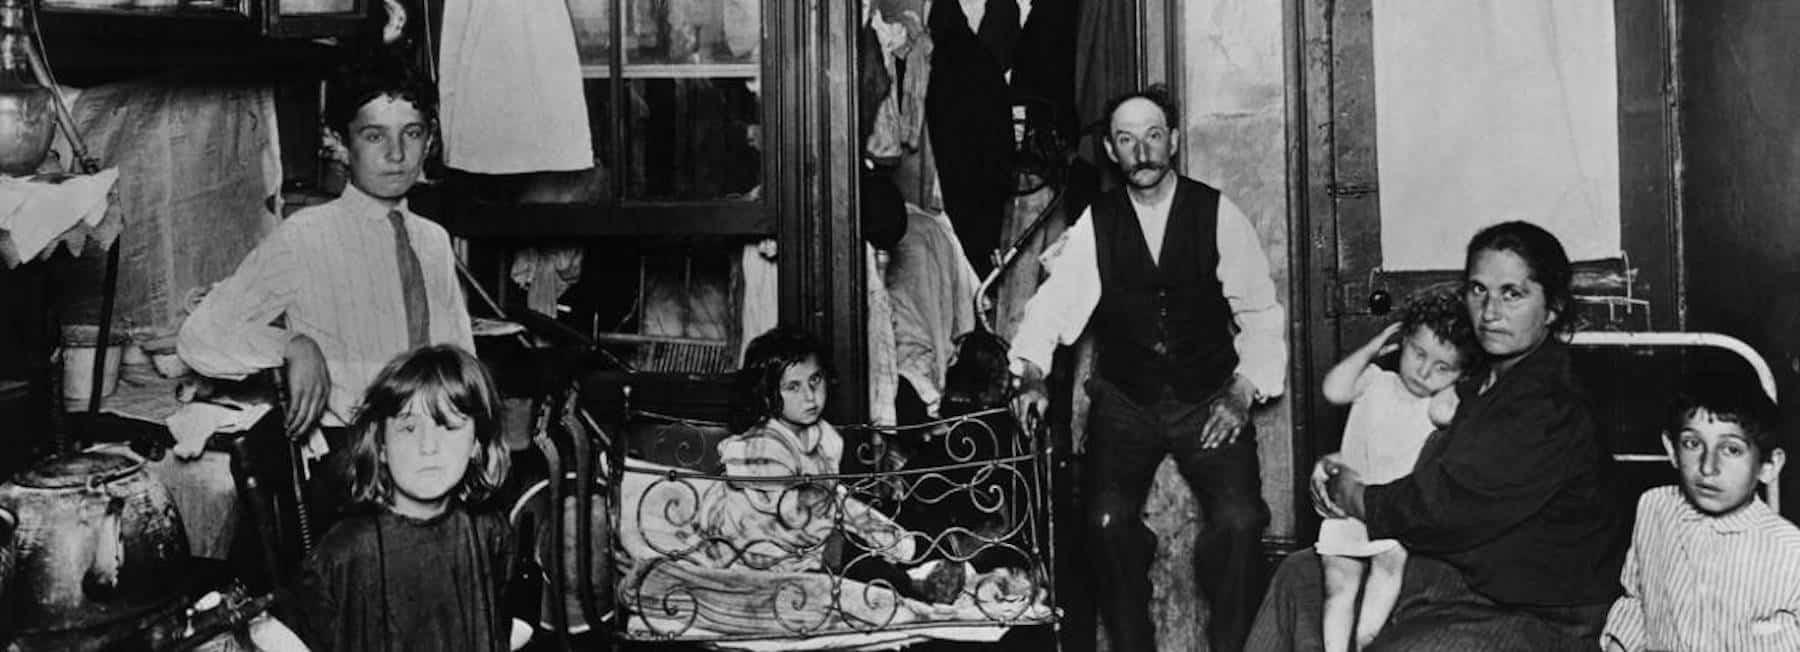 A Brief History of Humanitarian Photography